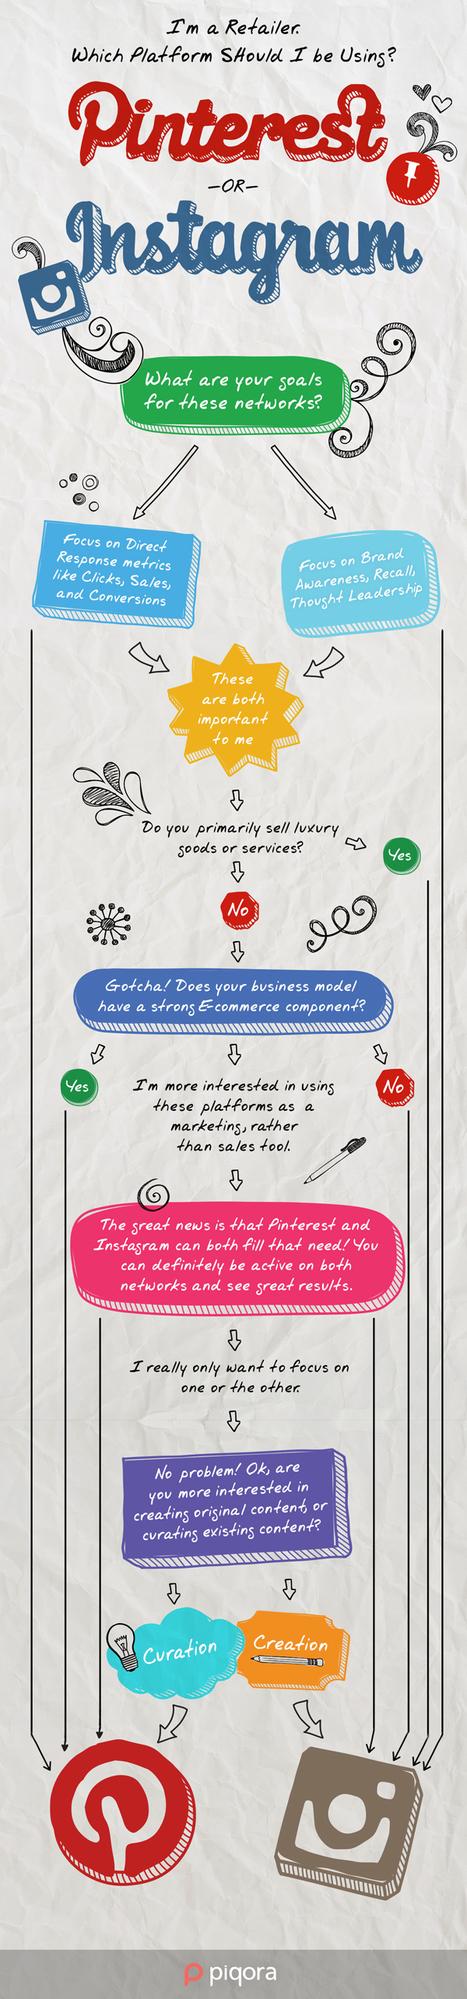 Retail Marketers: Should You Focus on Pinterest or Instagram? | Digital Marketing | Scoop.it